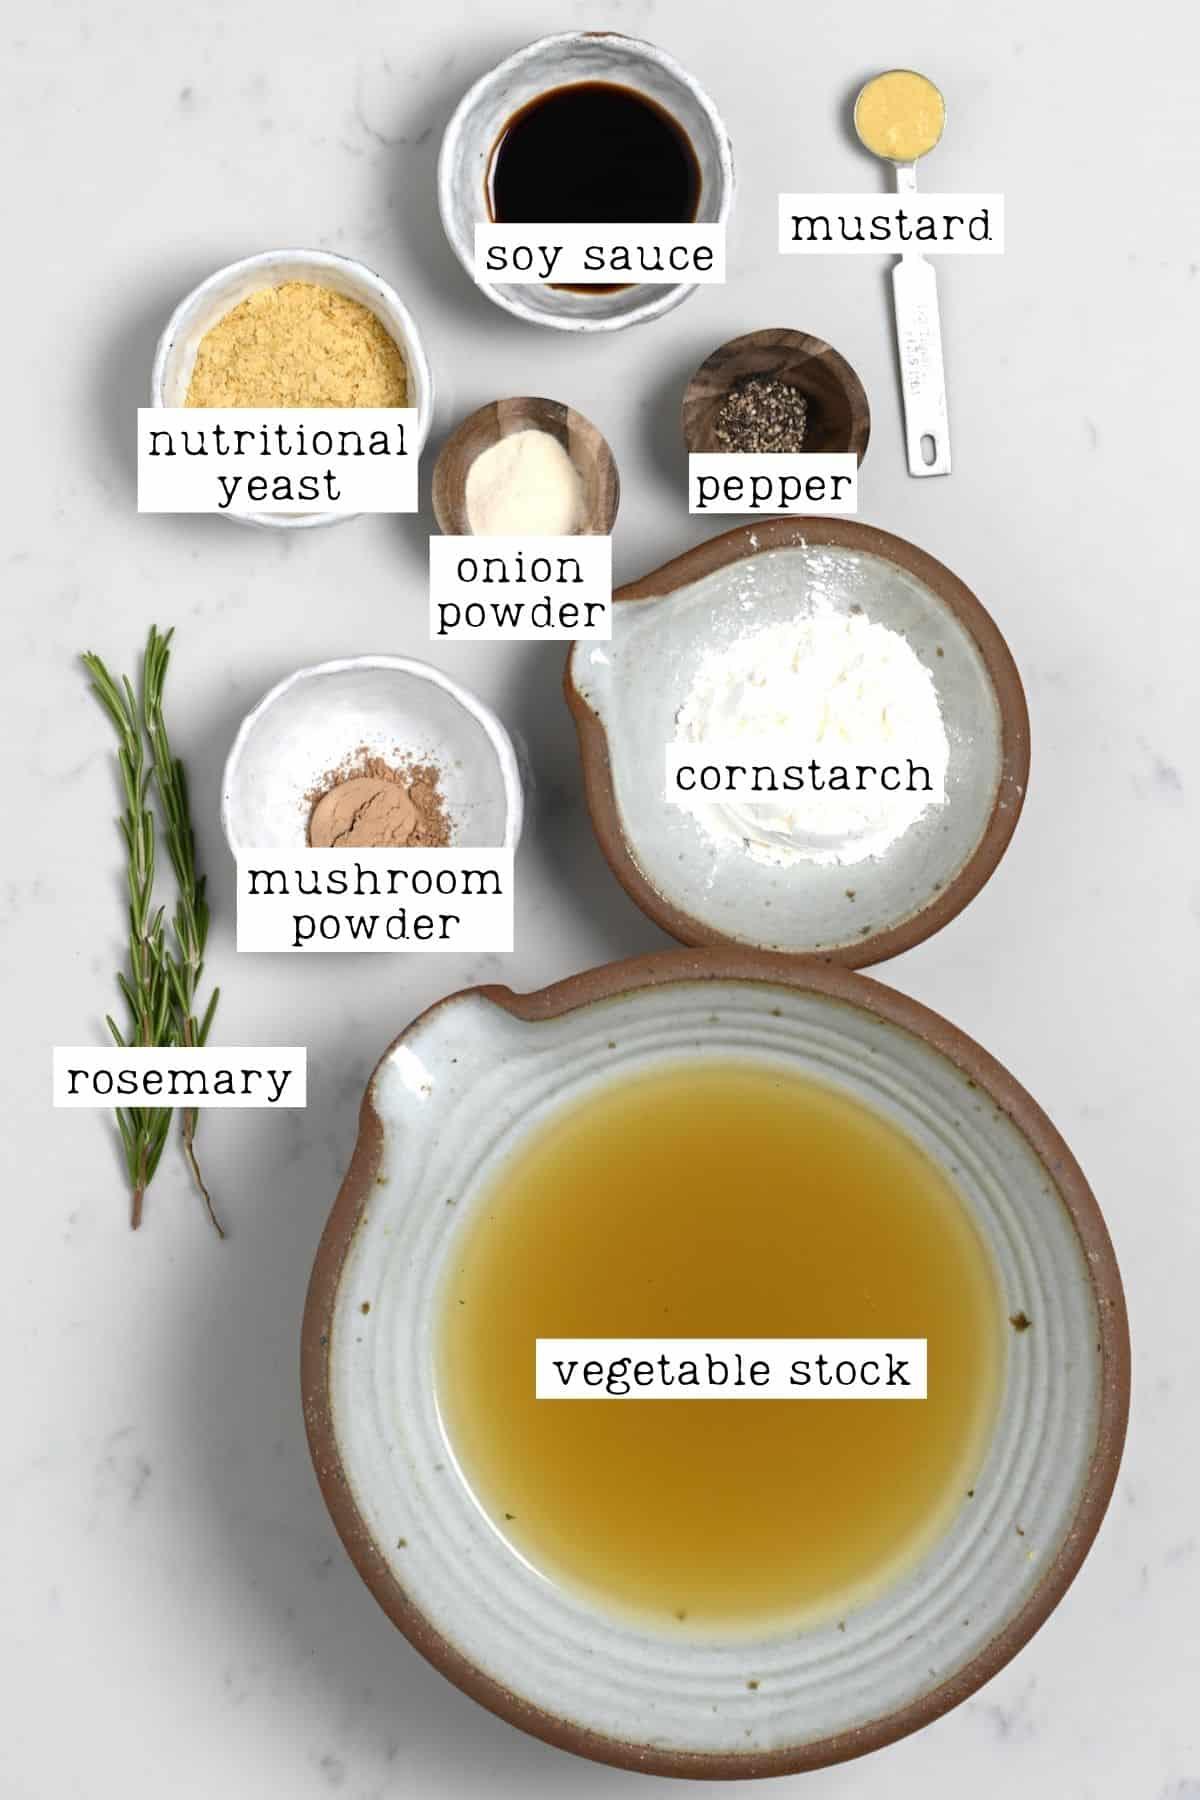 Ingredients for vegan gravy